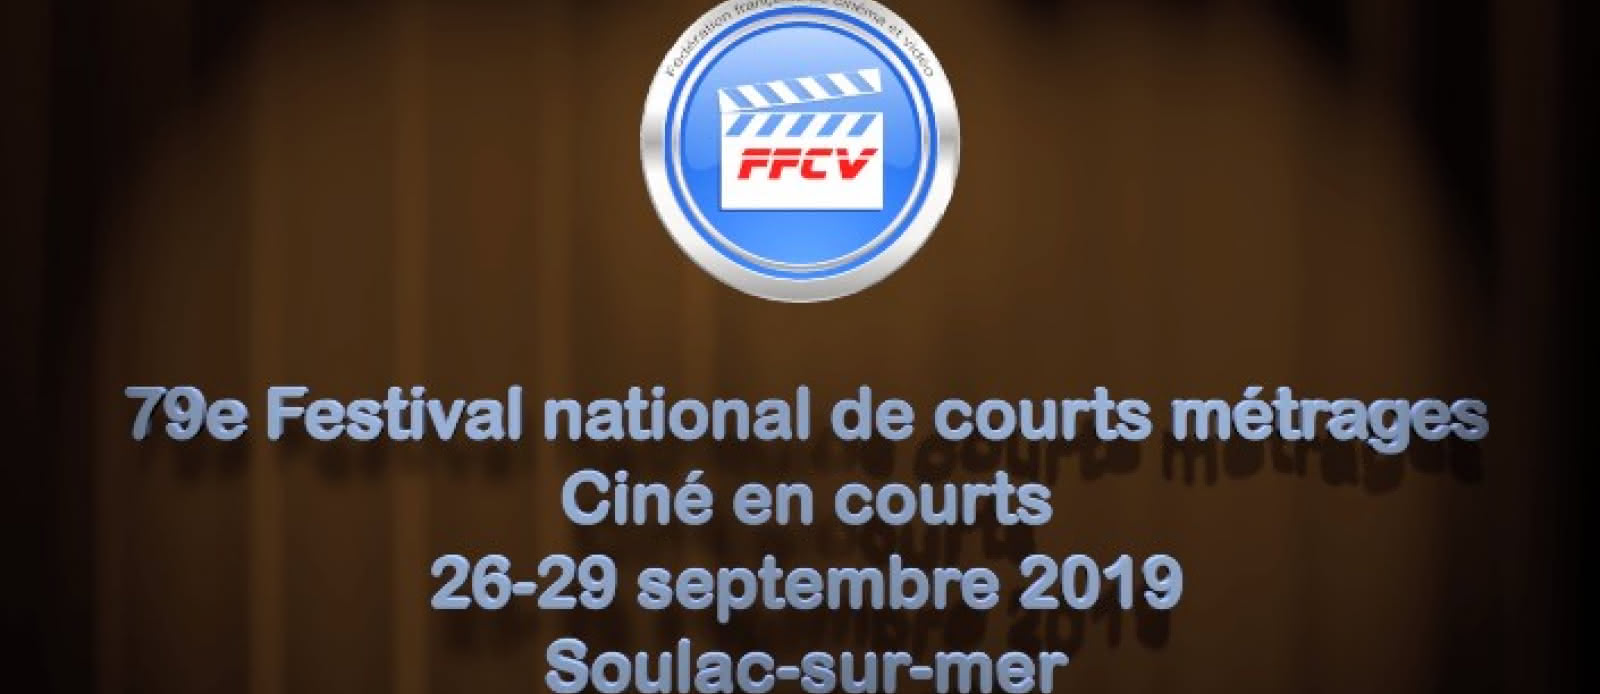 FFCV SOULAC 2019